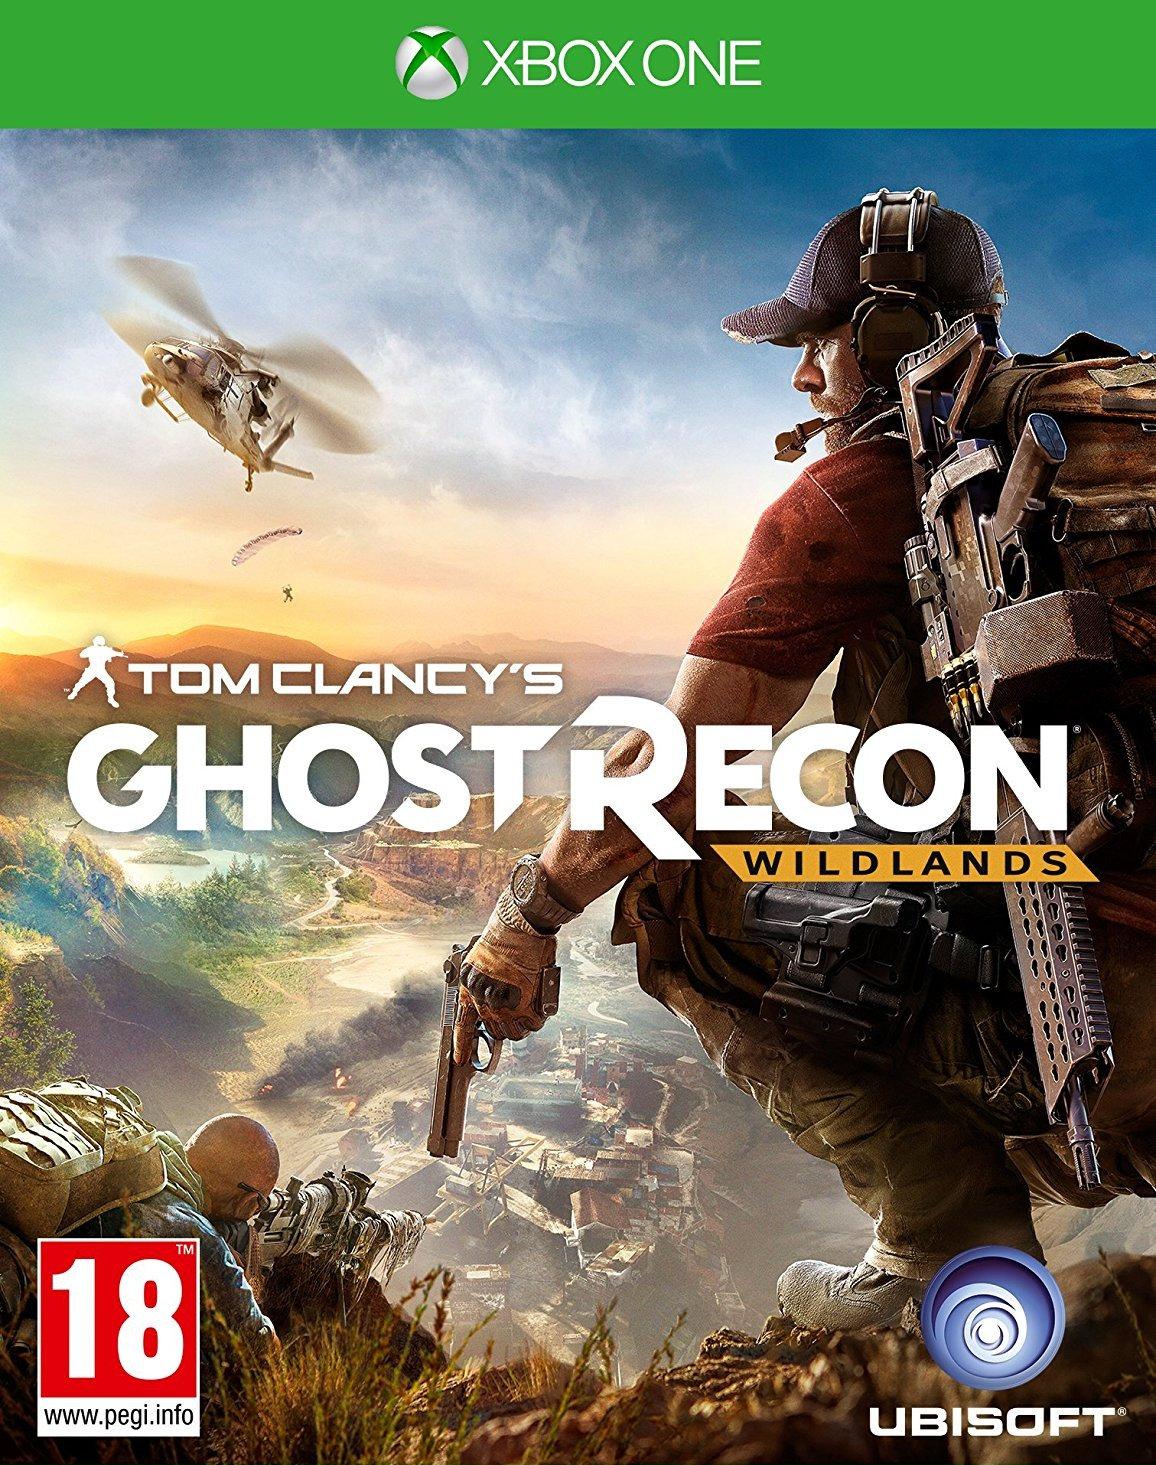 Jeu Tom Clancy's Ghost Recon : Wildlands sur Xbox One